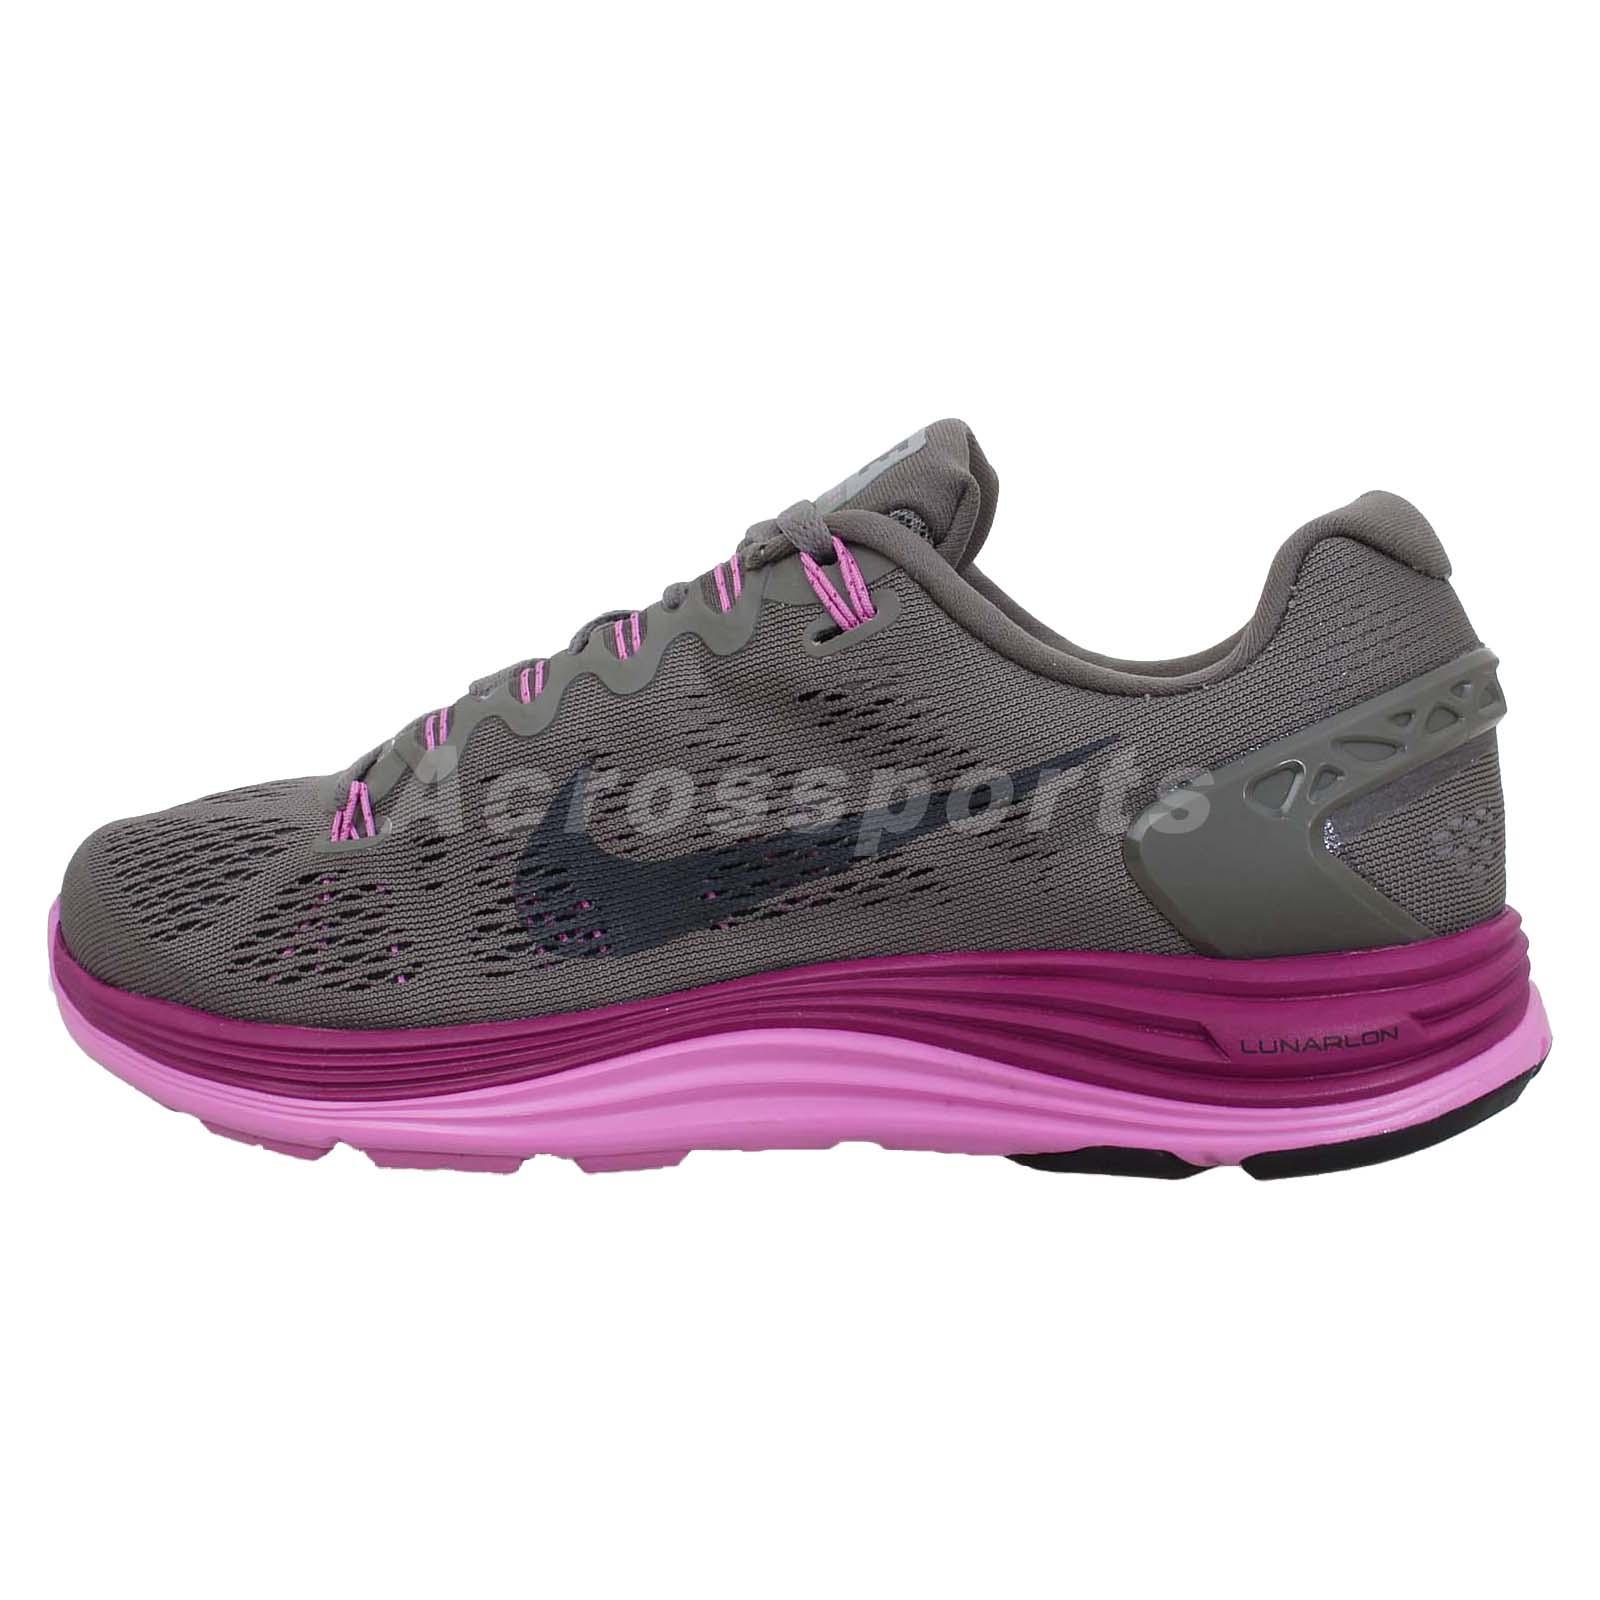 Luxury 62 Off Nike Shoes  Nike Womens Lunarlon From Jennie39s Closet On